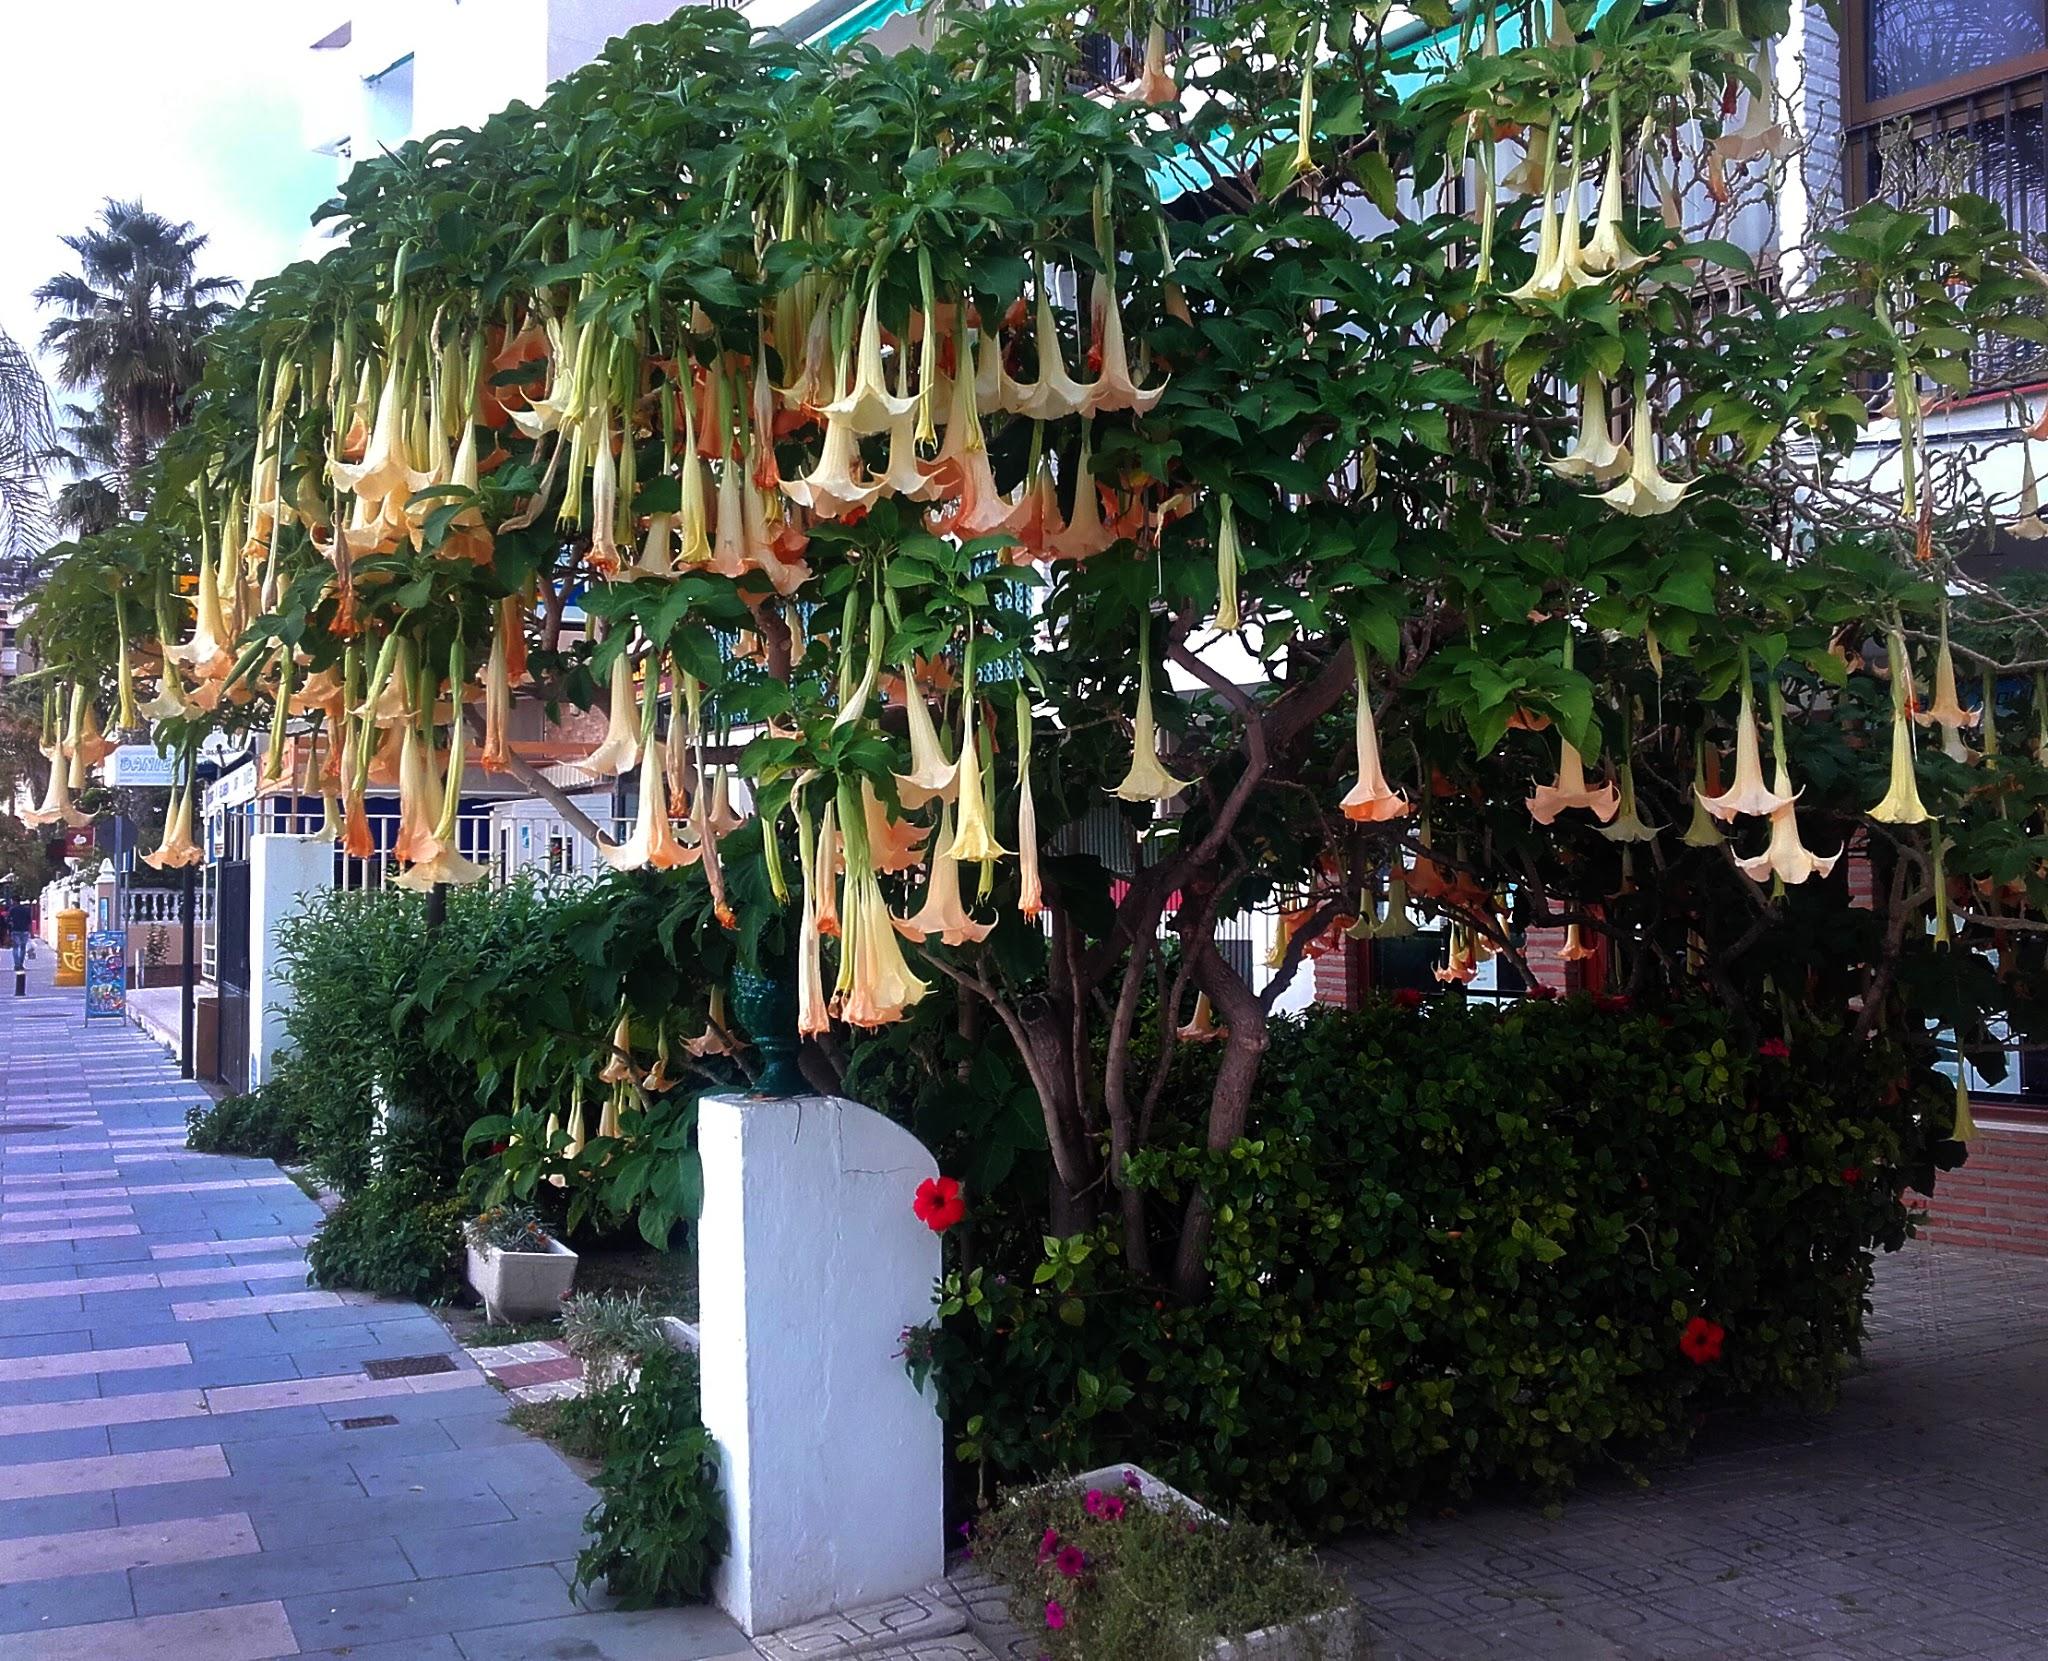 Angel's Trumpet plant in Spain